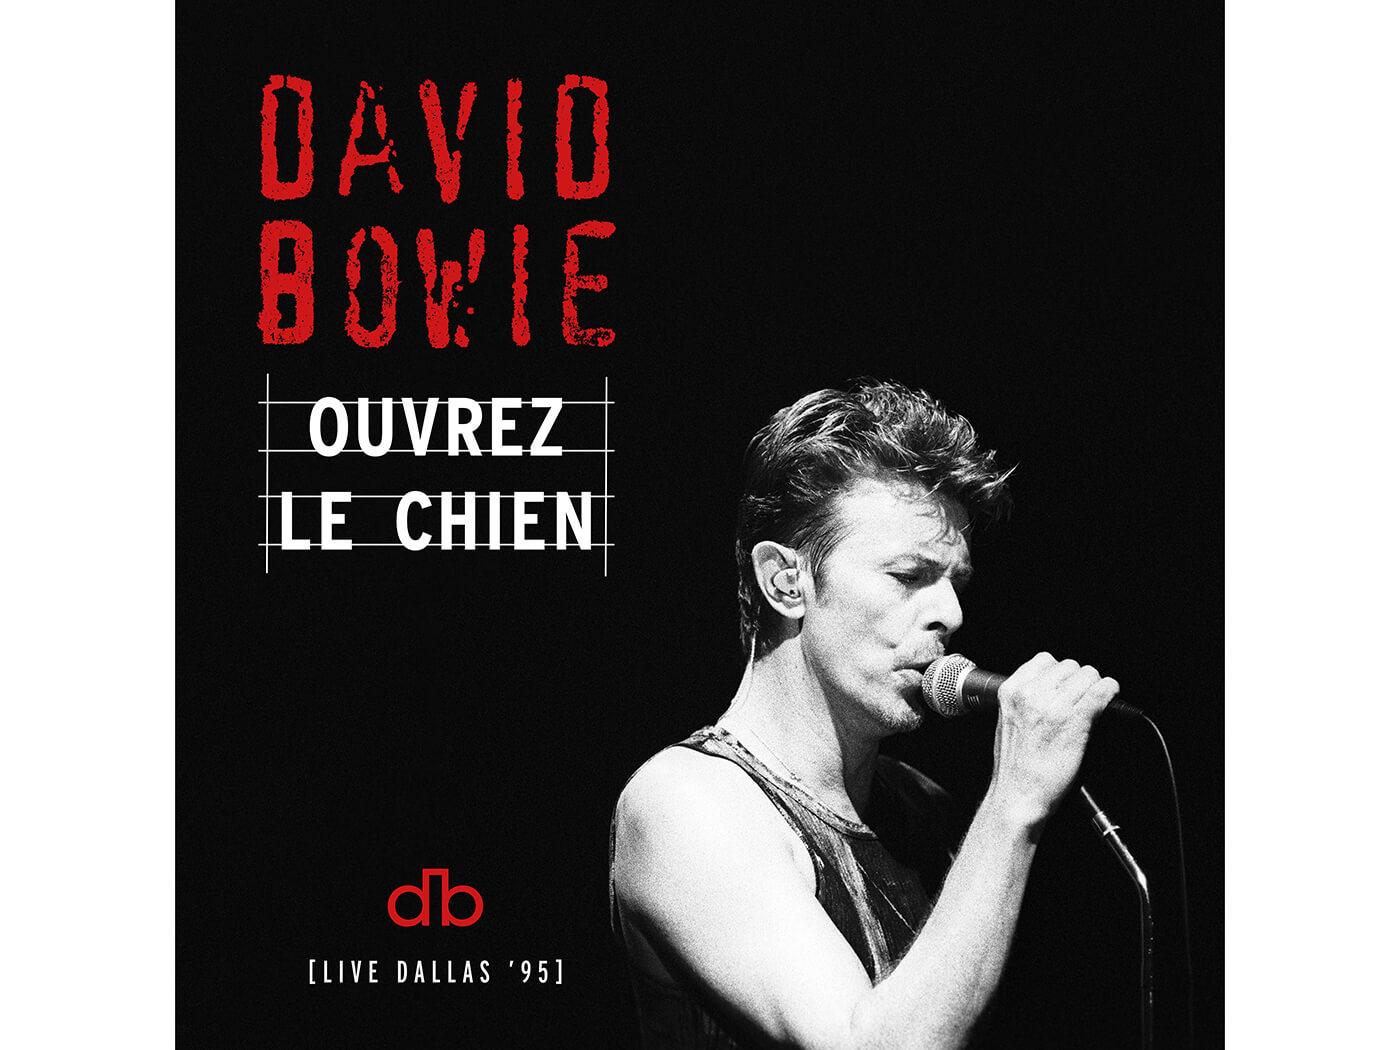 New 1995 David Bowie live album coming next week